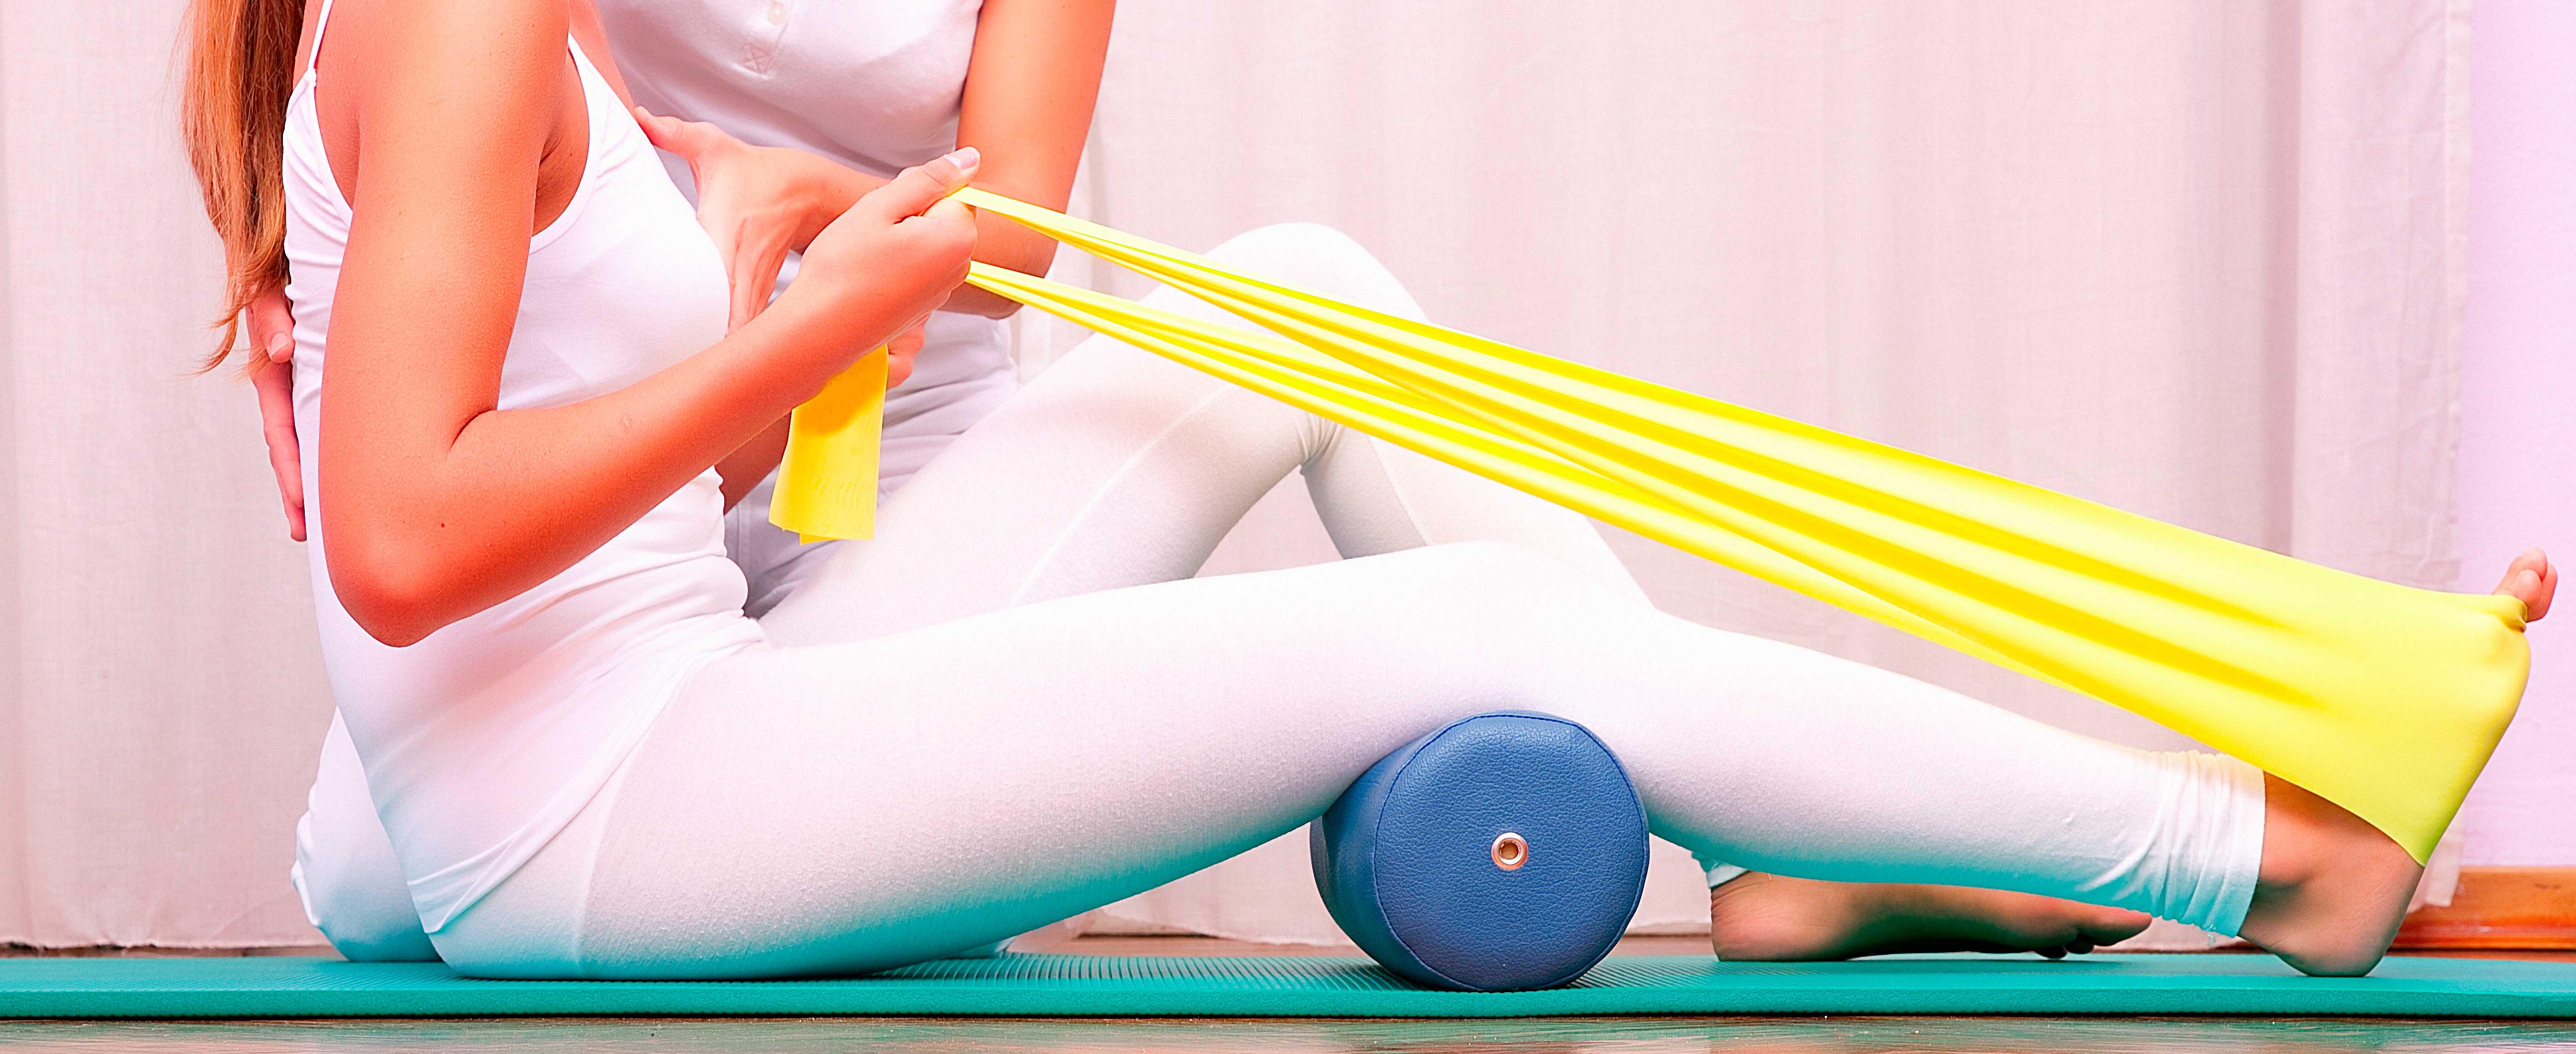 fysiotherapie gorecht hoogezand